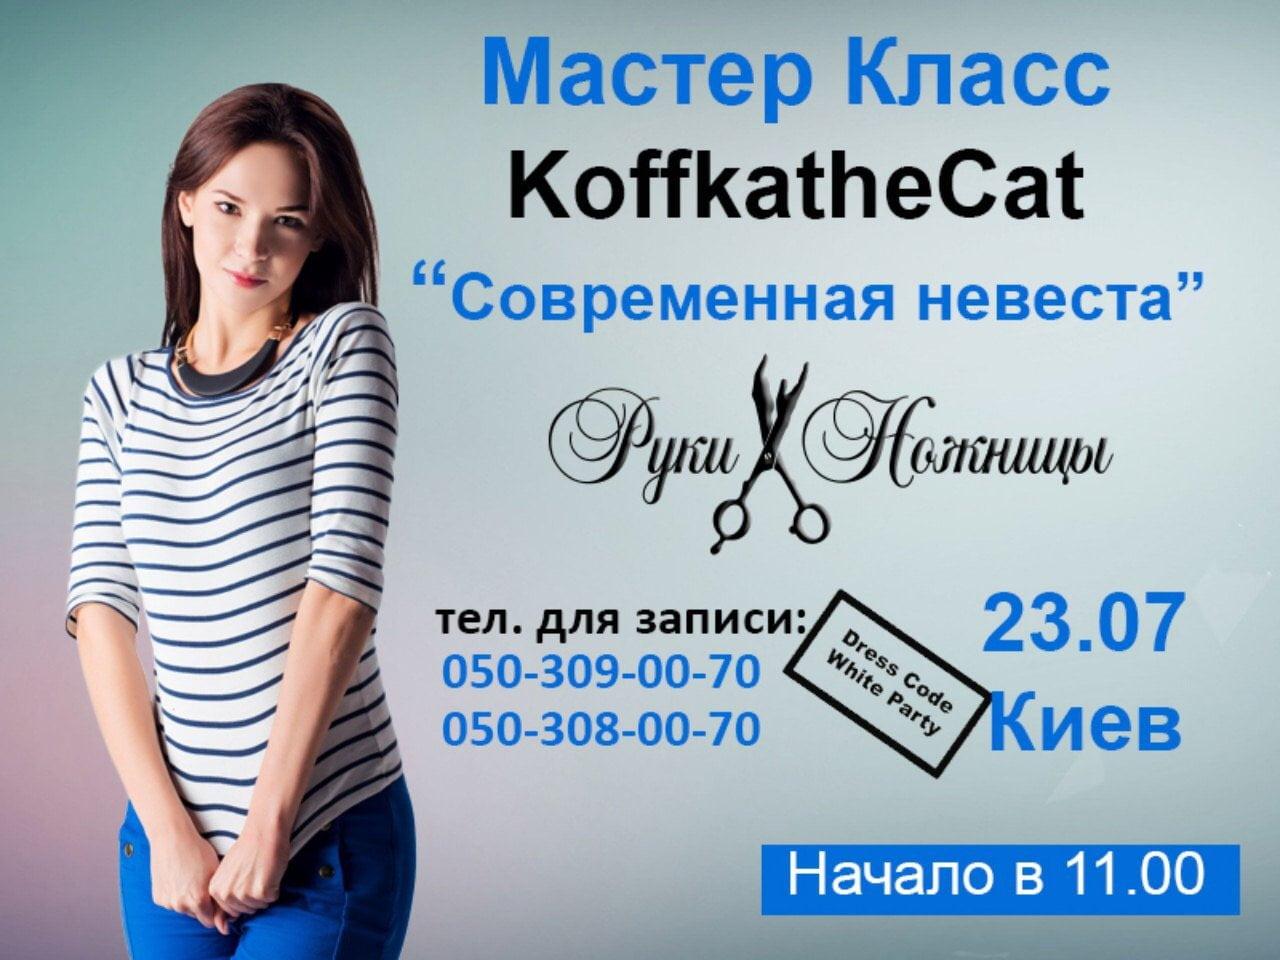 23 июля — Мастер Класс Виктории Моисеевой (KoffkatheCat)